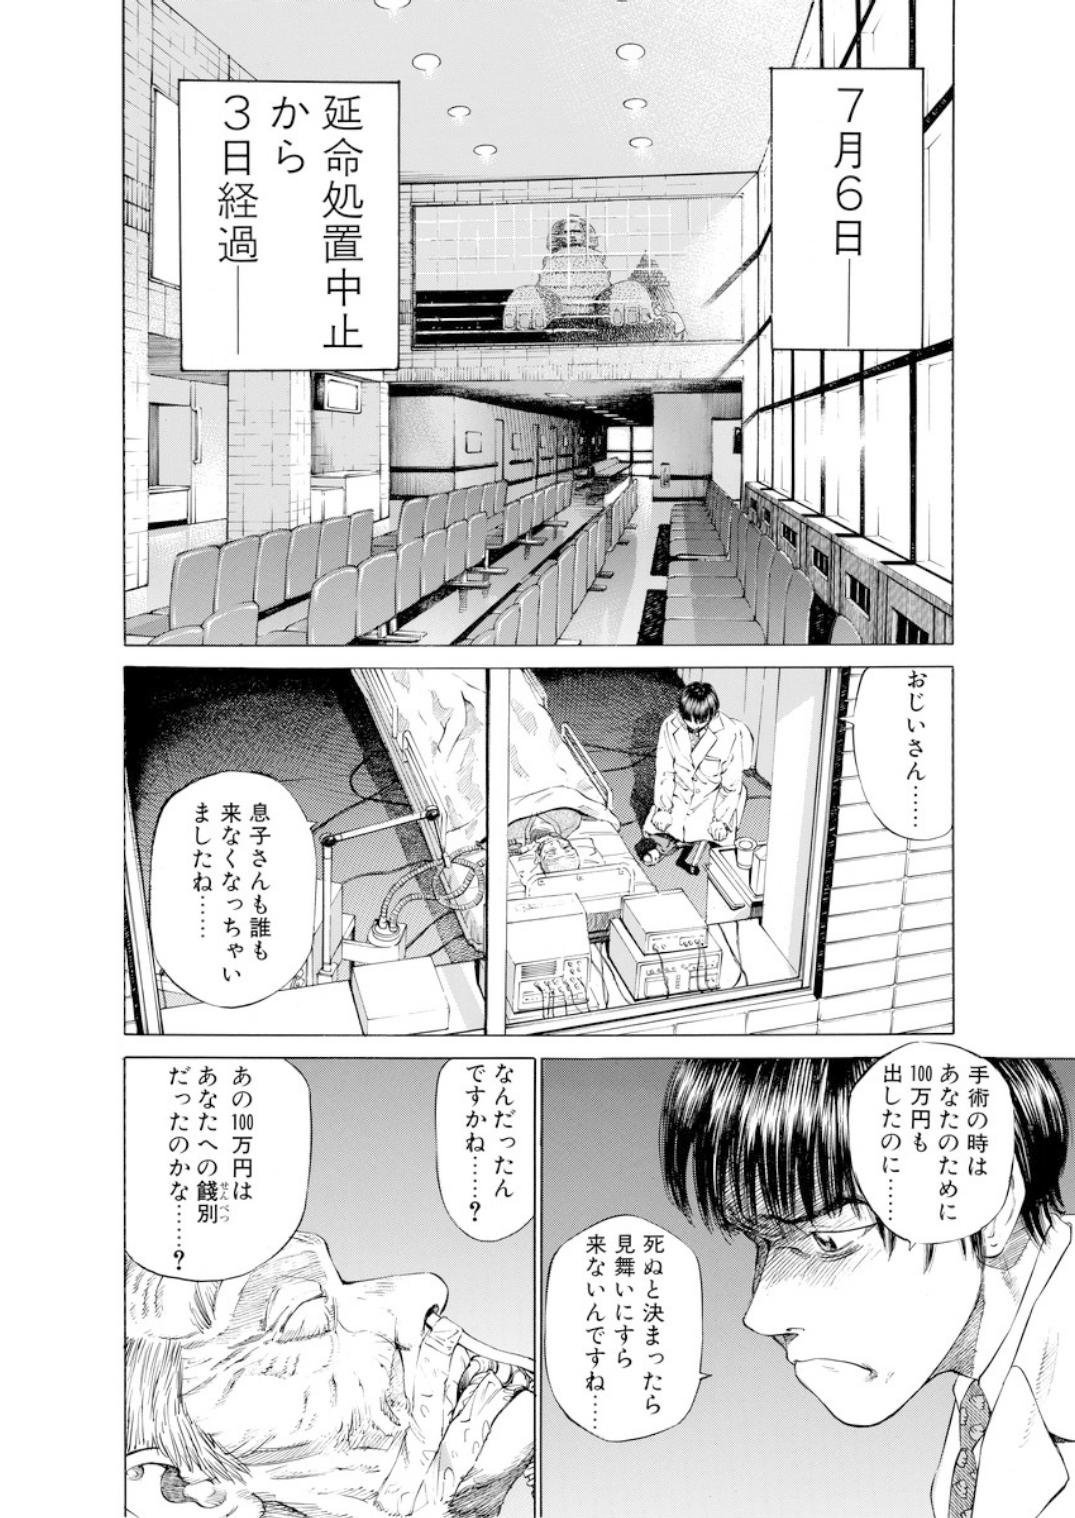 001bj_page-0118.jpg